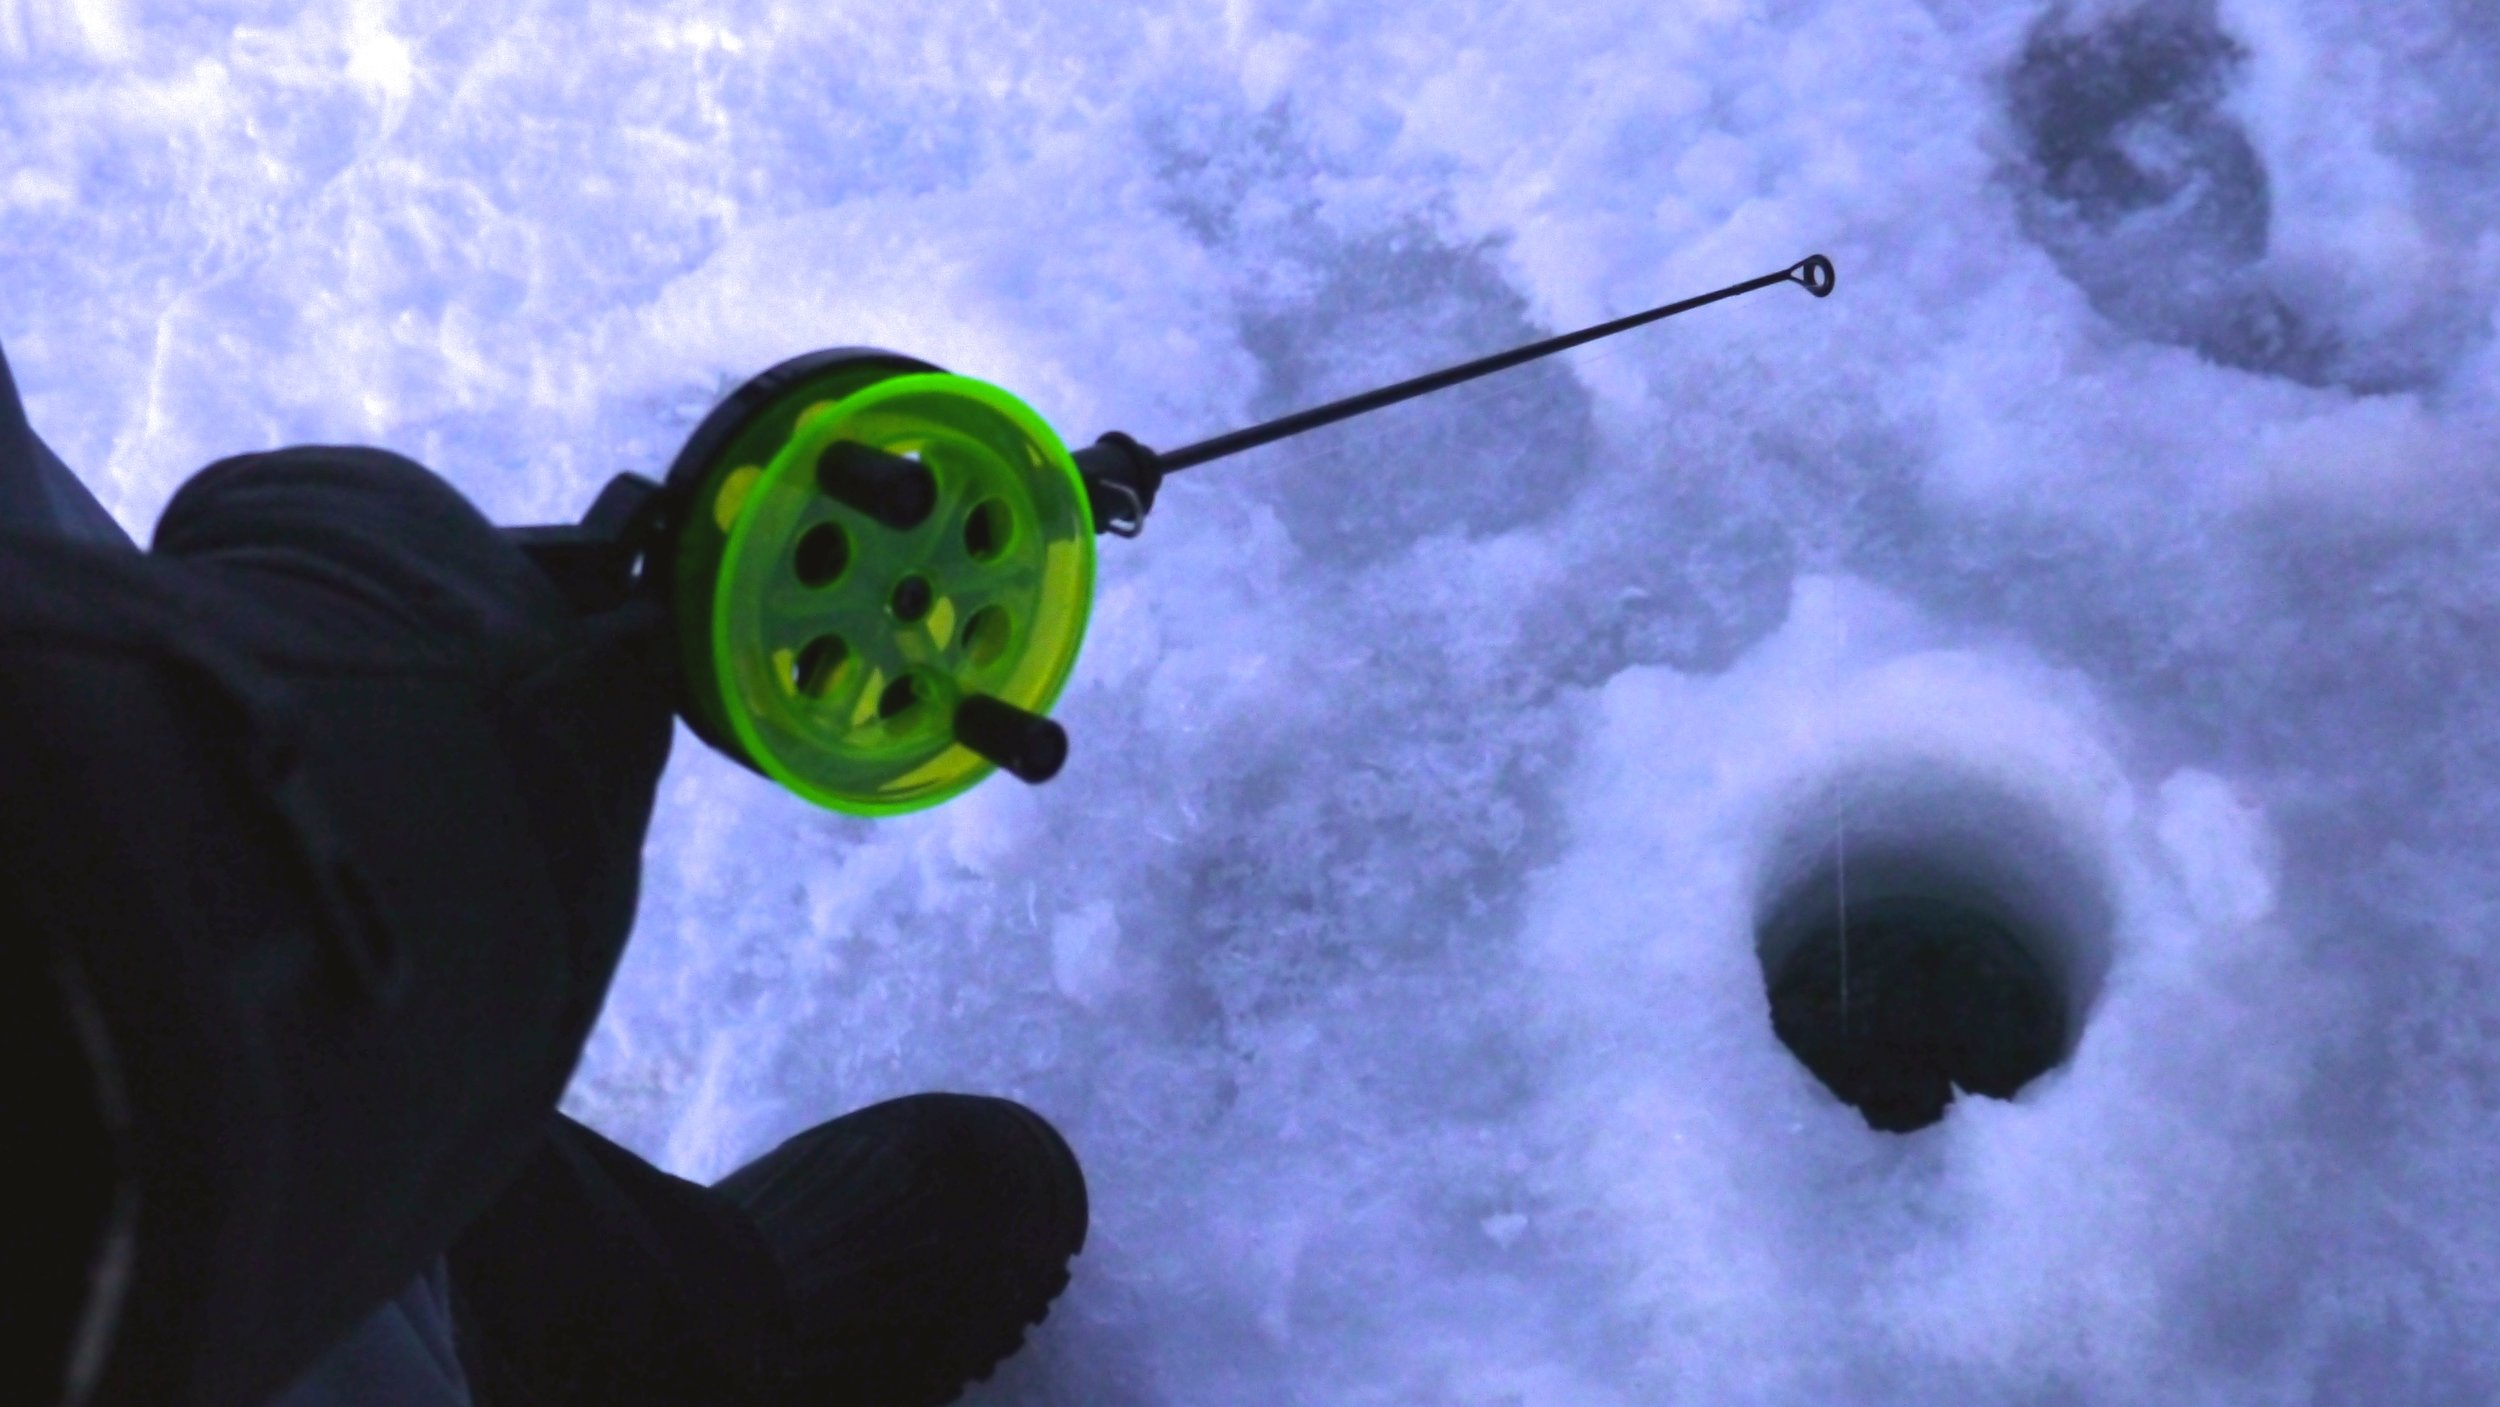 12-23-14 Fishing CU copy 2.jpg